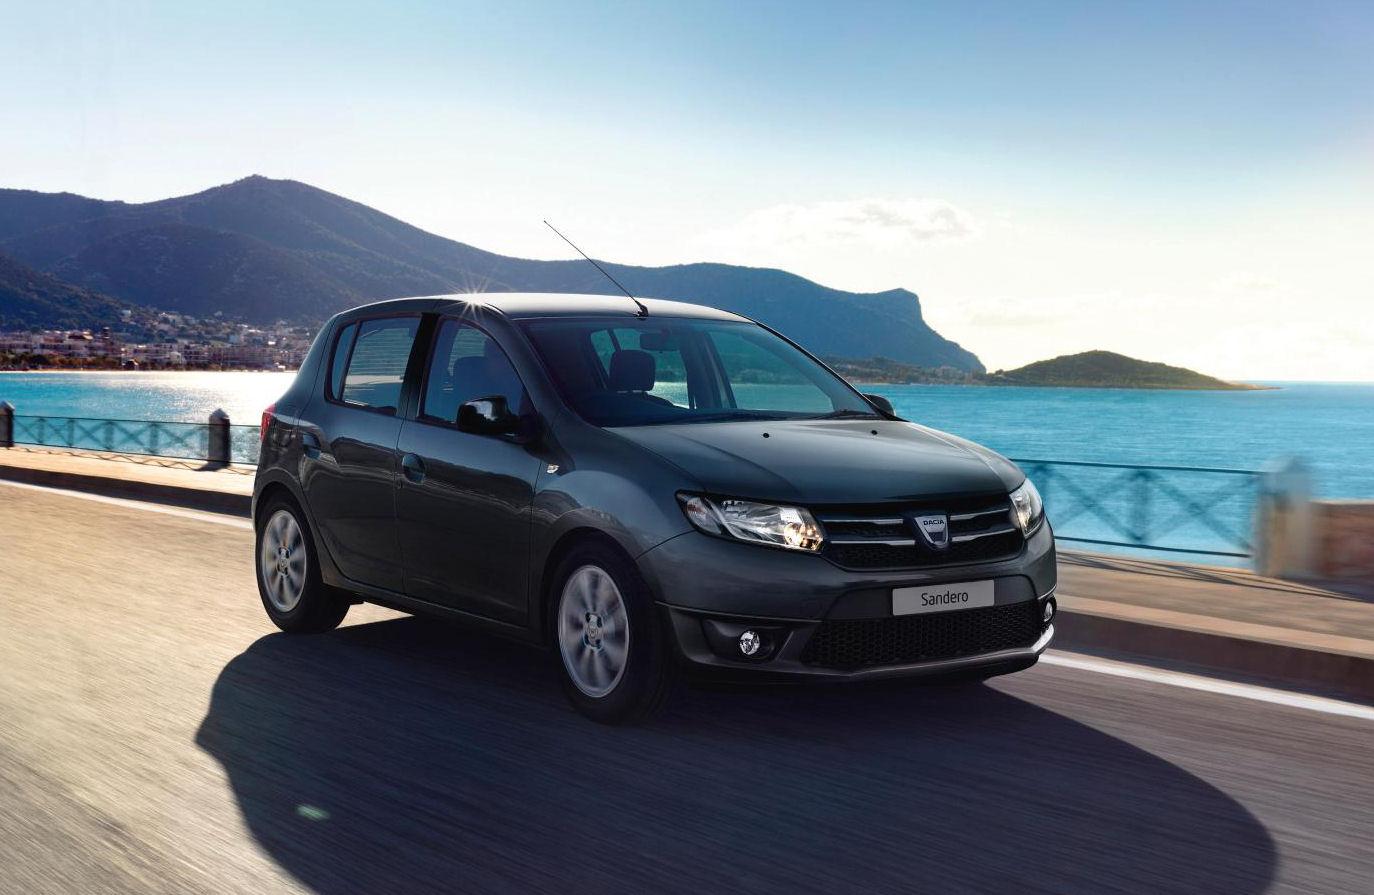 Dacia Launches Sandero Midnight Limited Edition